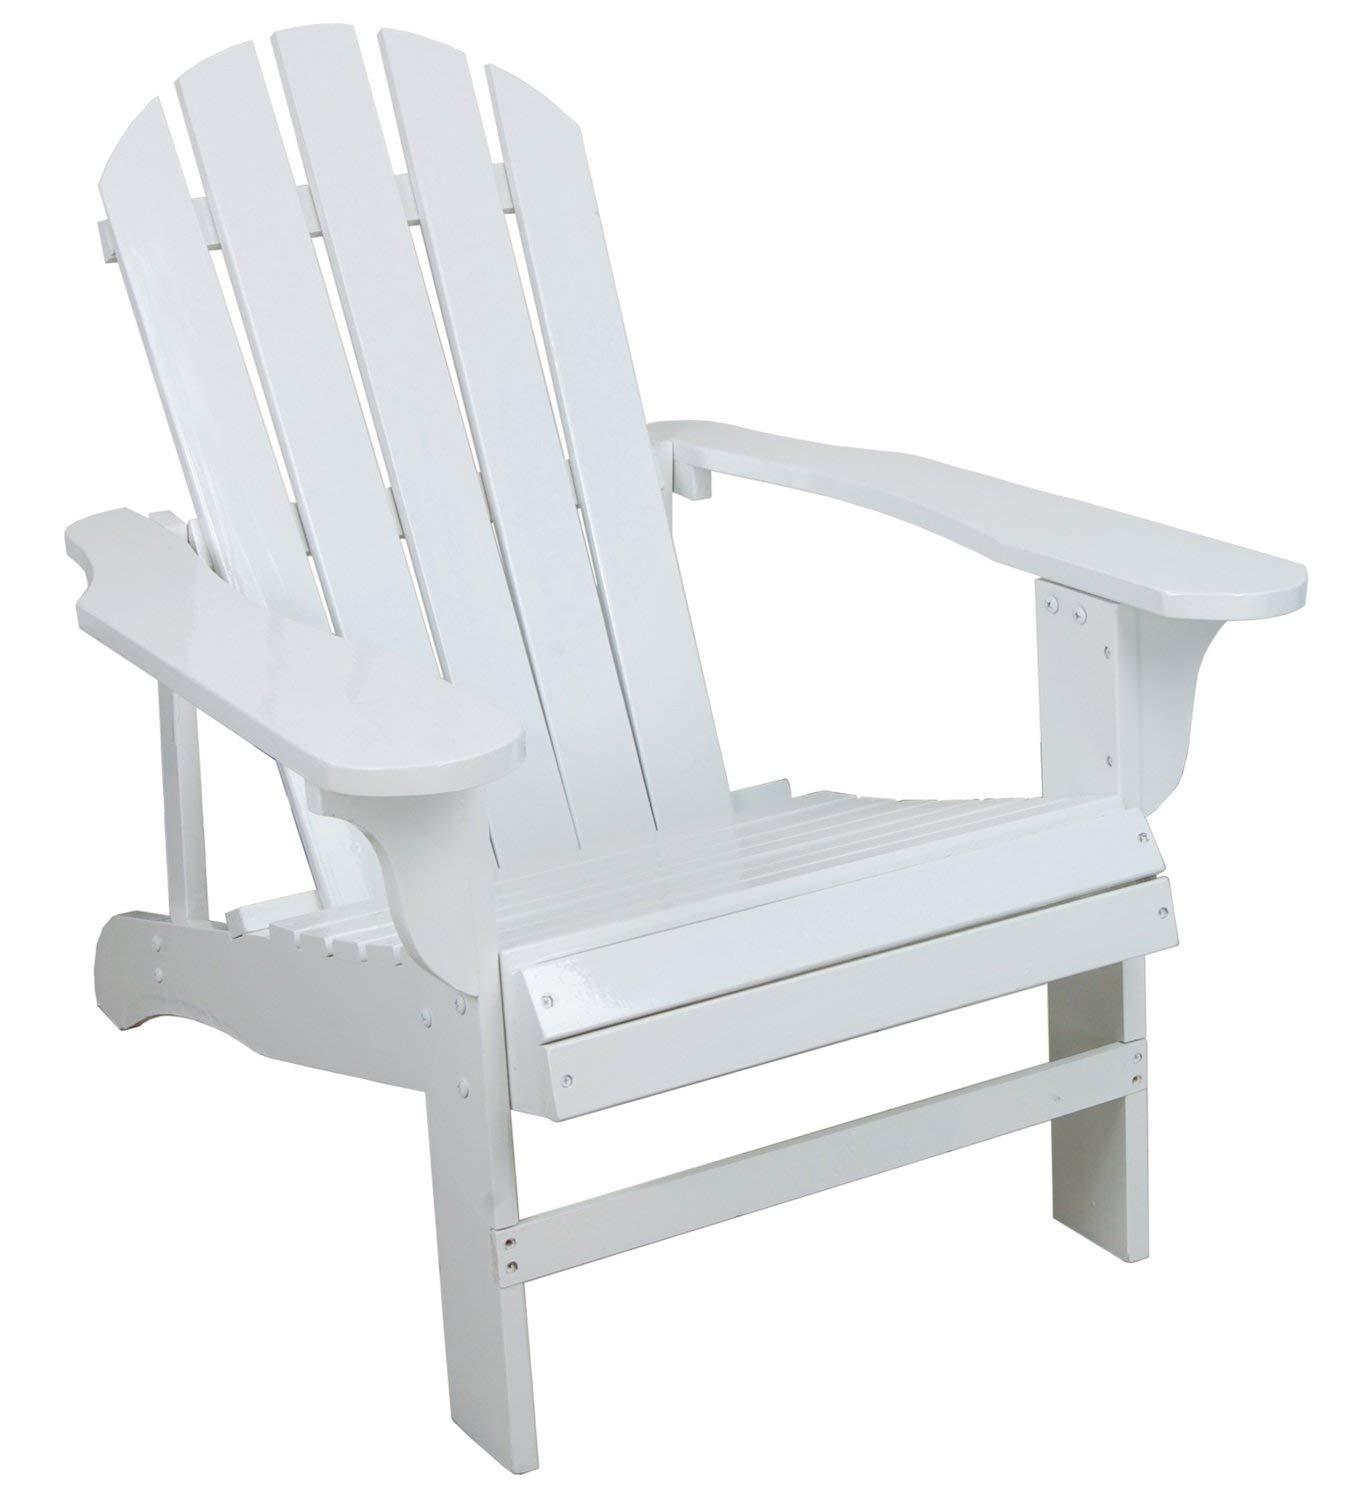 Adirondack chairs amazon.com: classic white lacquered wooden chair Adirondack chair: chaise longues FMXATVK